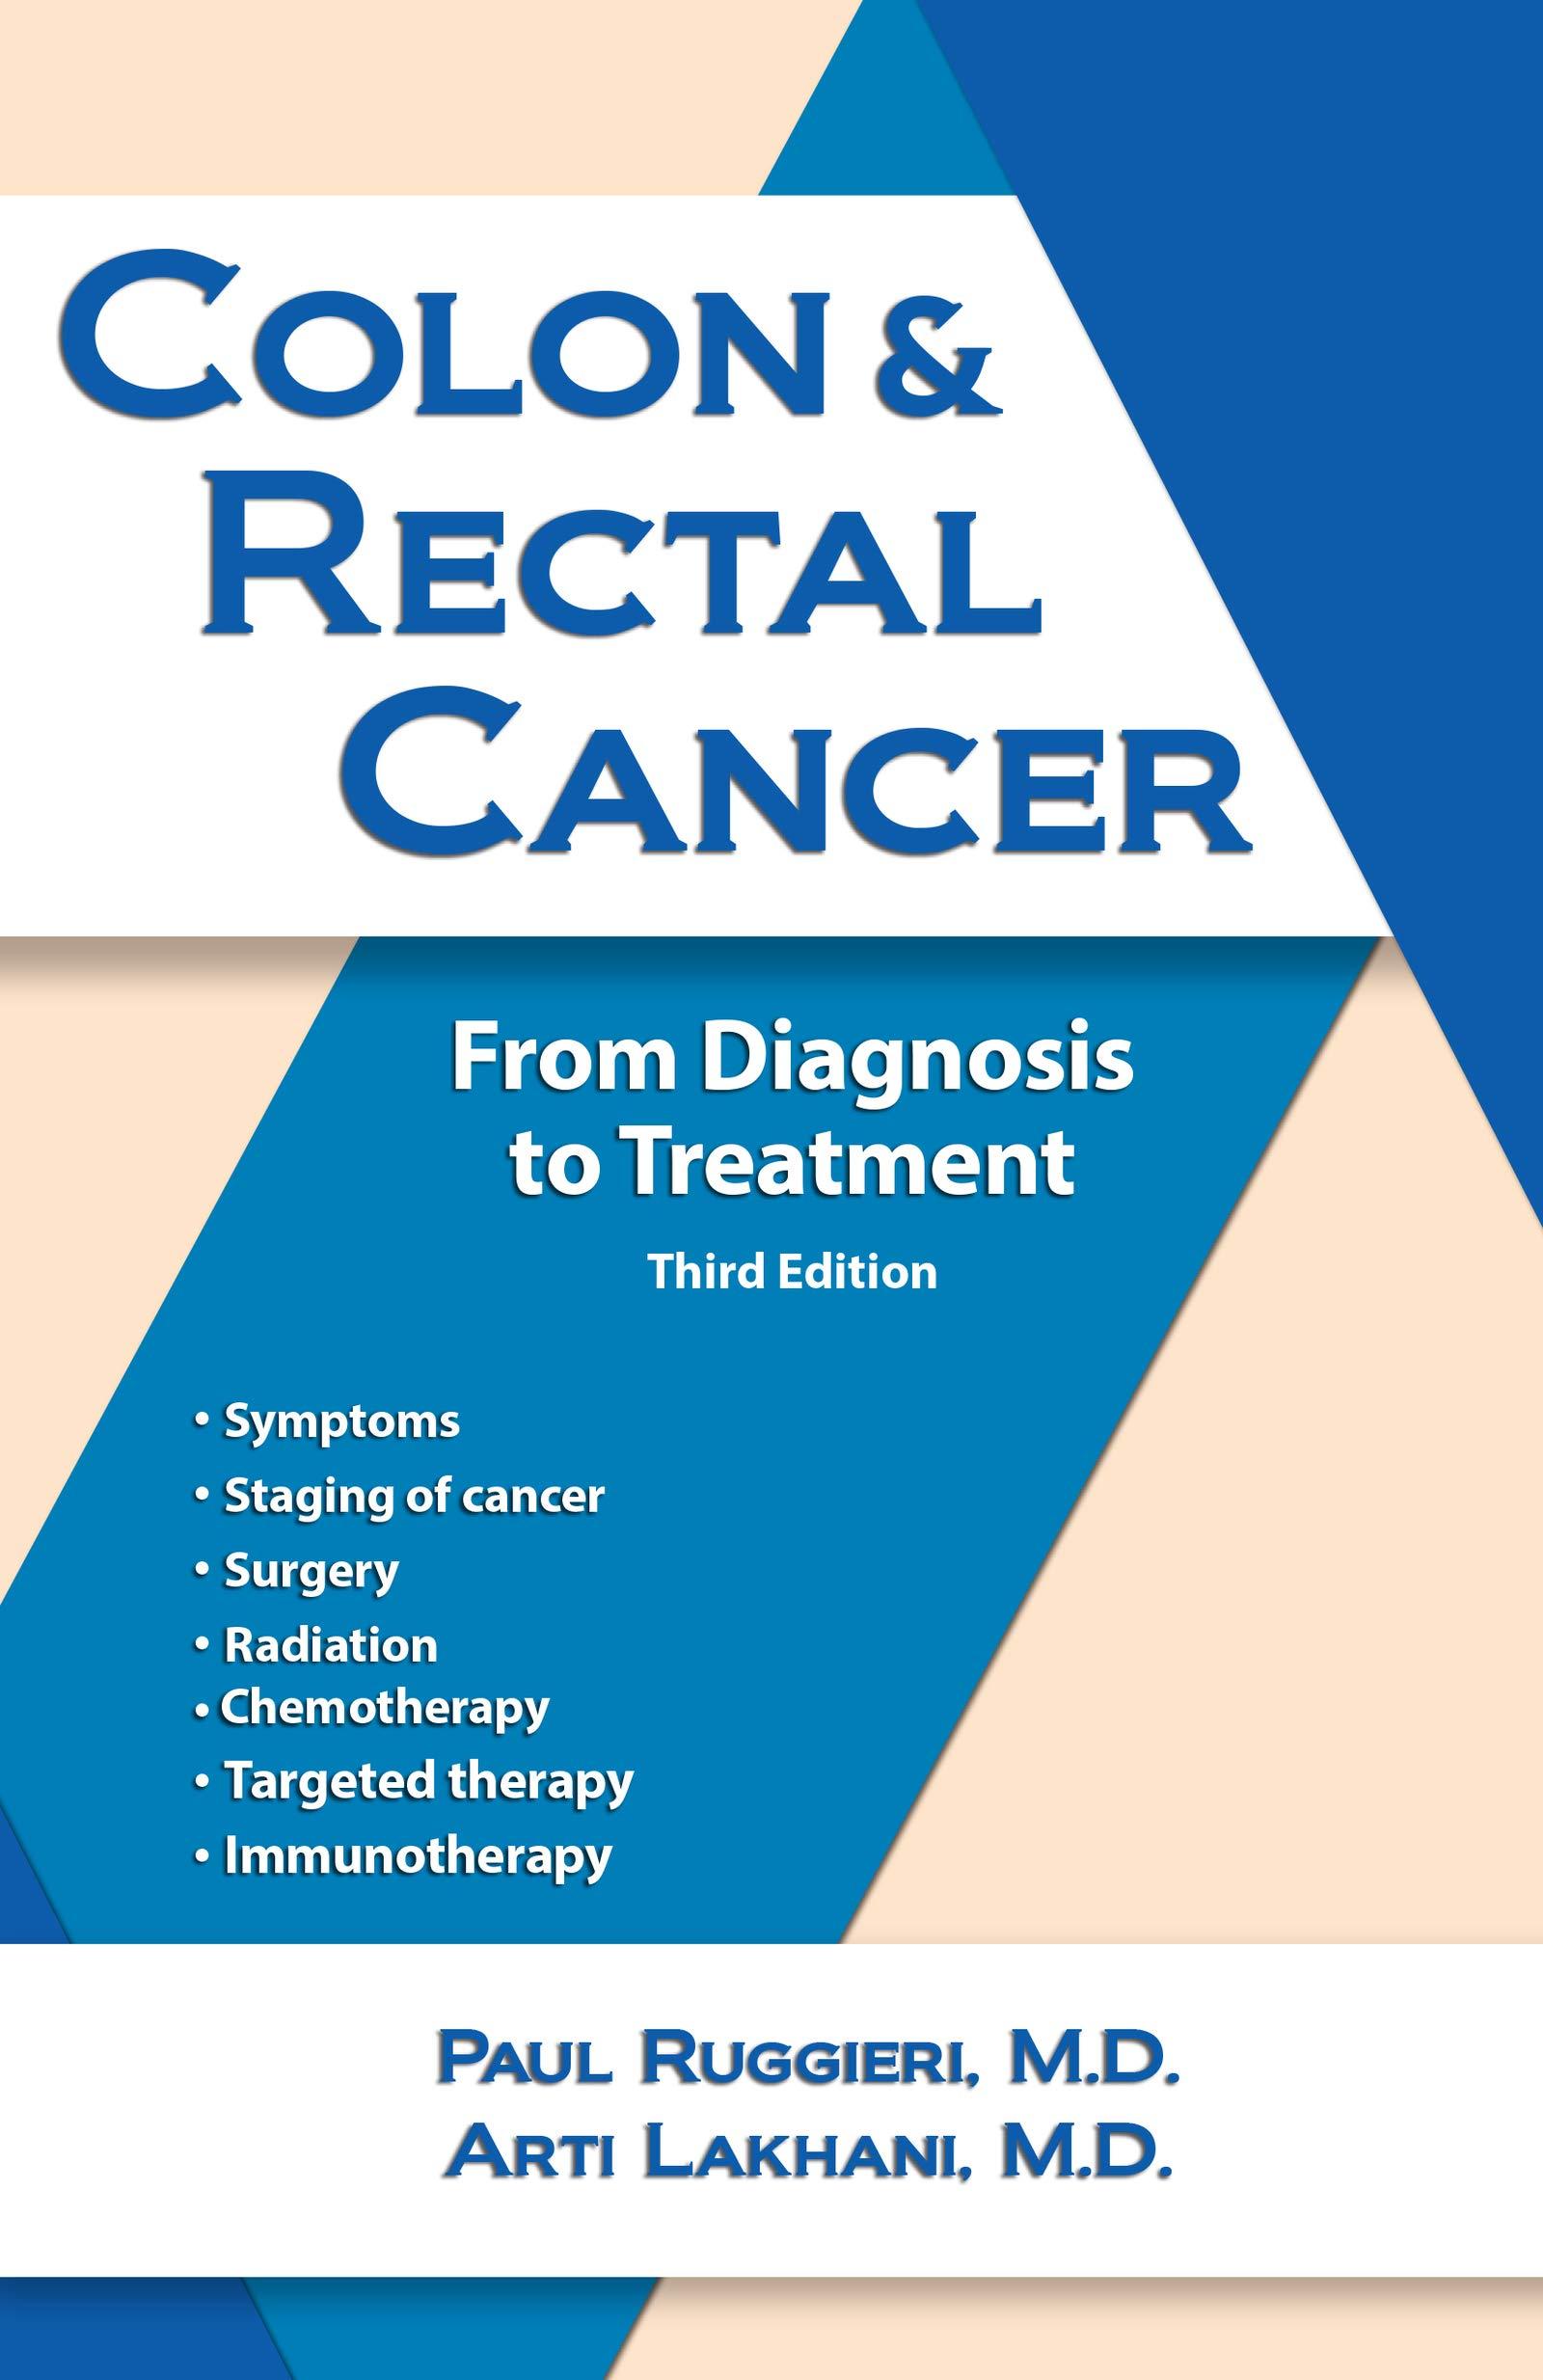 Amazon Com Colon Rectal Cancer From Diagnosis To Treatment Ebook Ruggieri Paul Tolentino Addison R Kindle Store